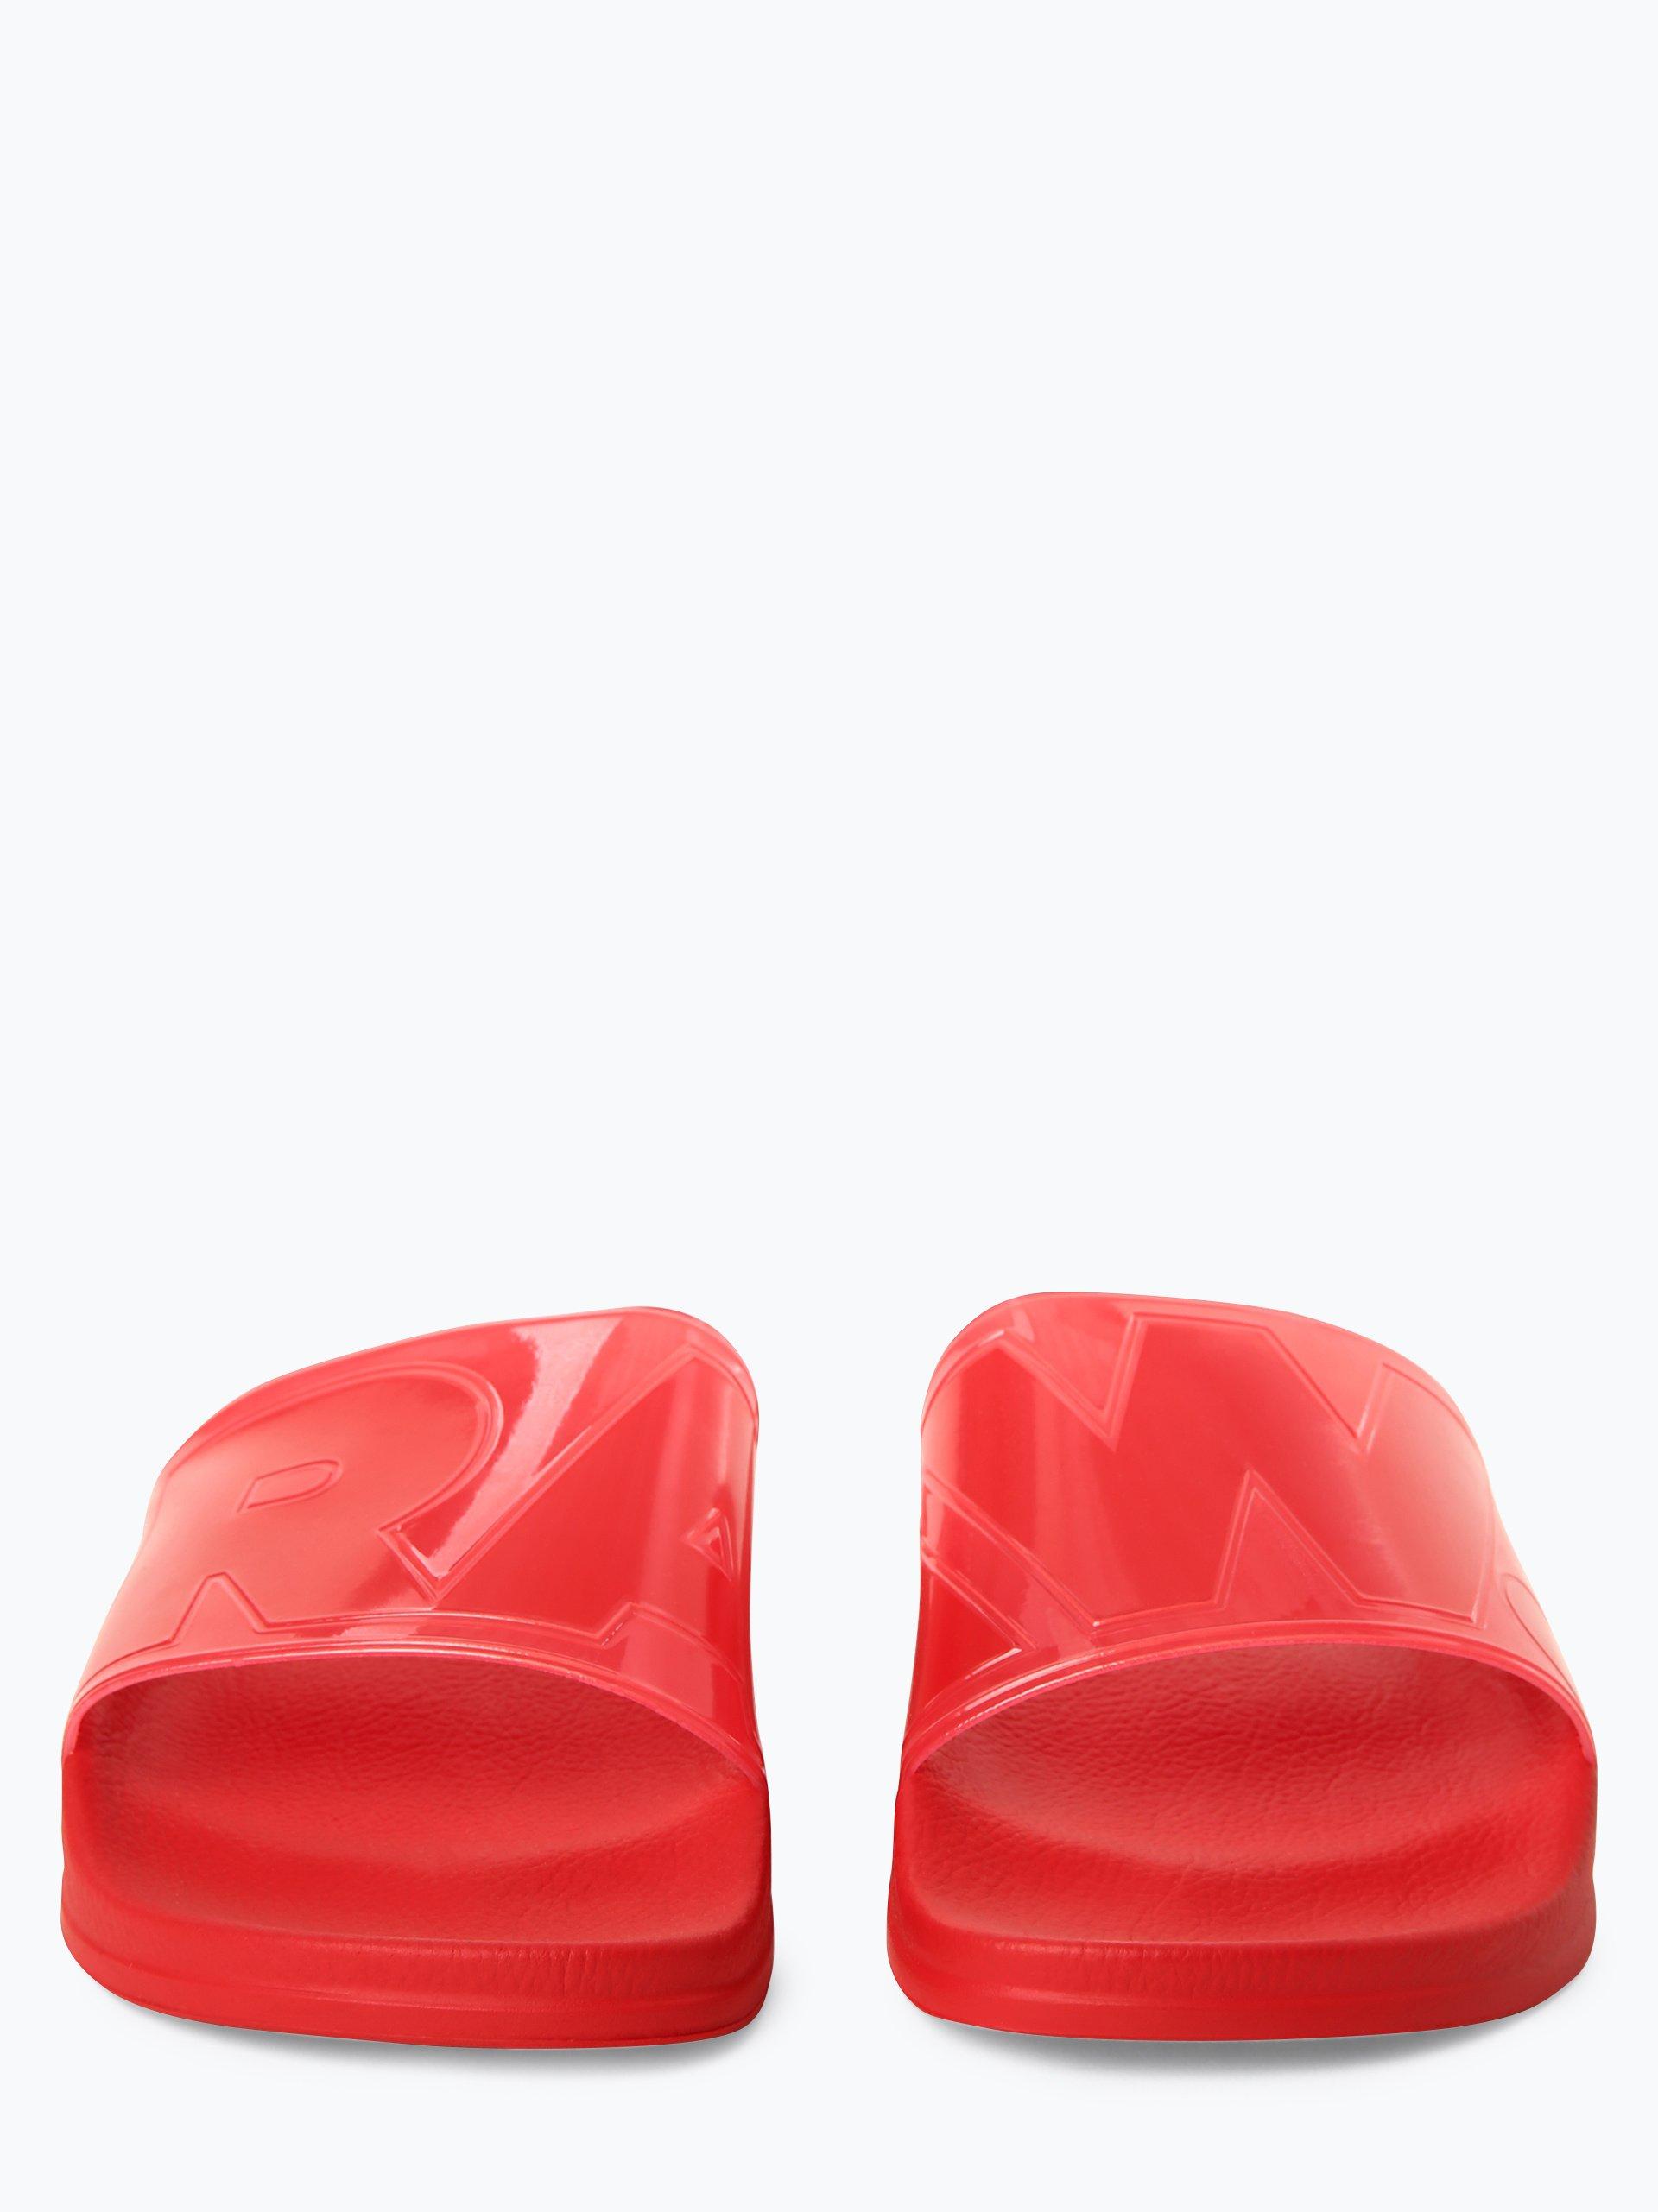 G-Star Męskie pantofle kąpielowe – Cart